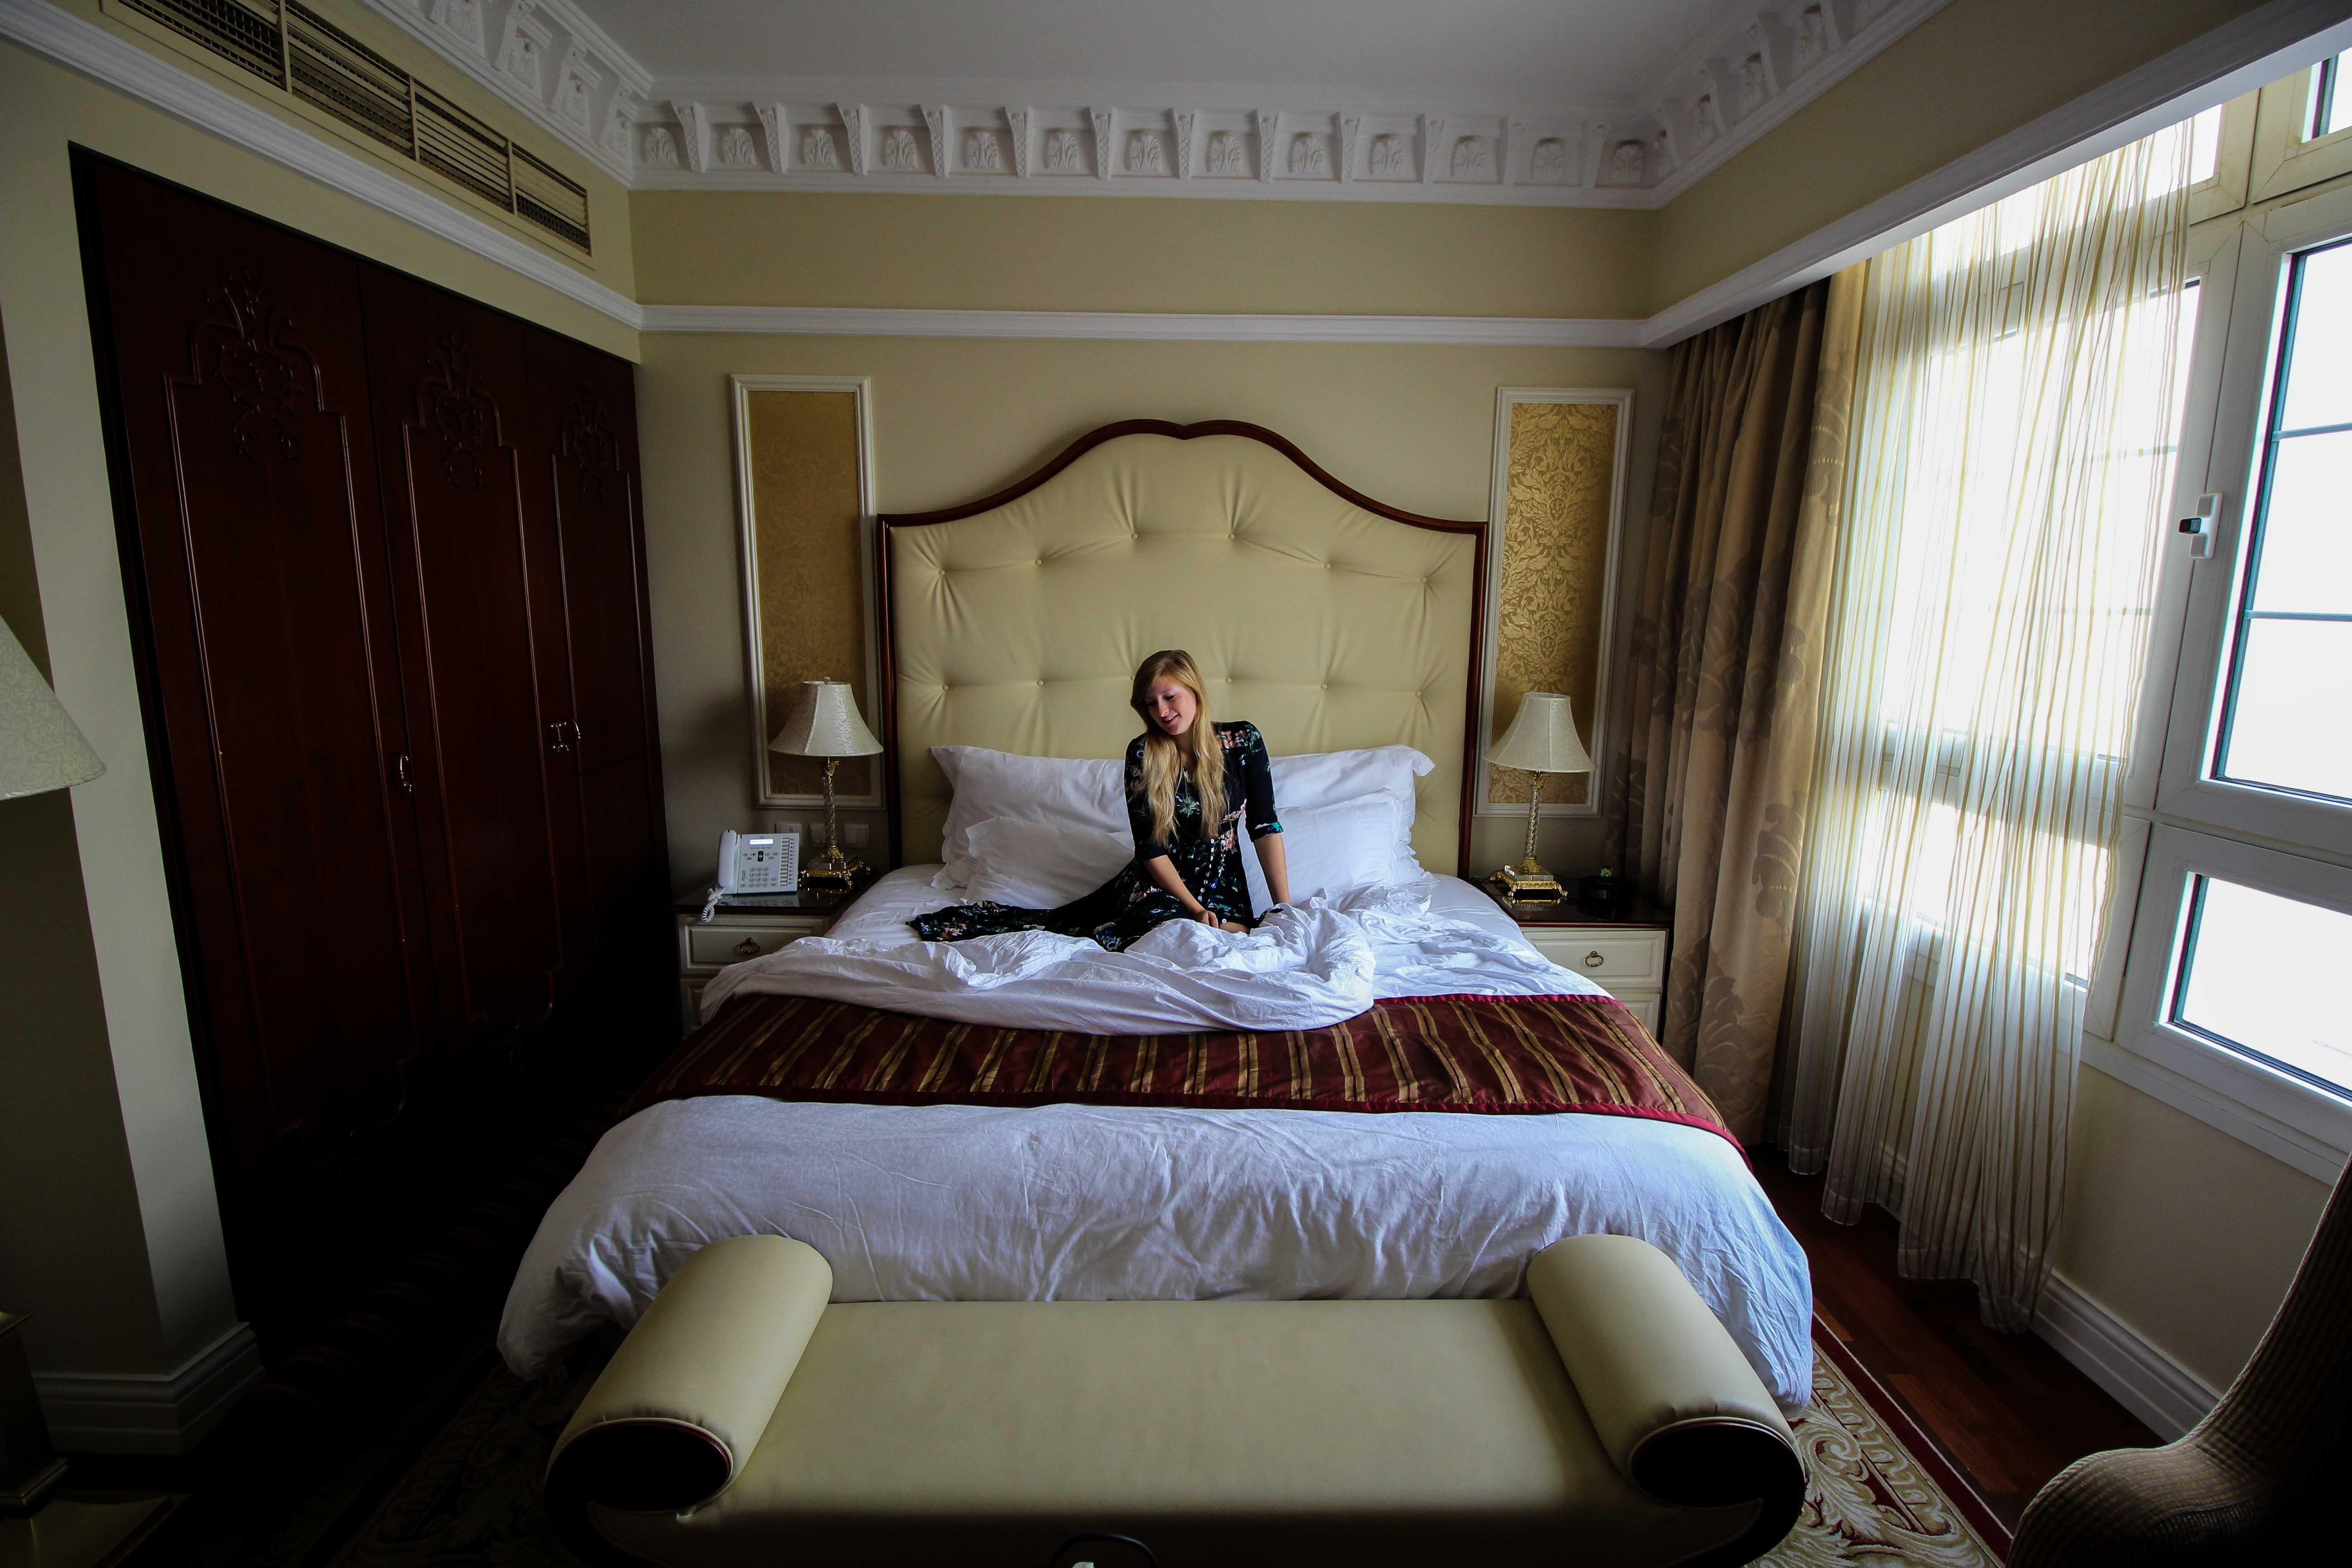 Warwick Hotel Doha Executive Room Kingsize bett Luxushotel 5 Sterne Hotel Qatar Reiseblog Katar